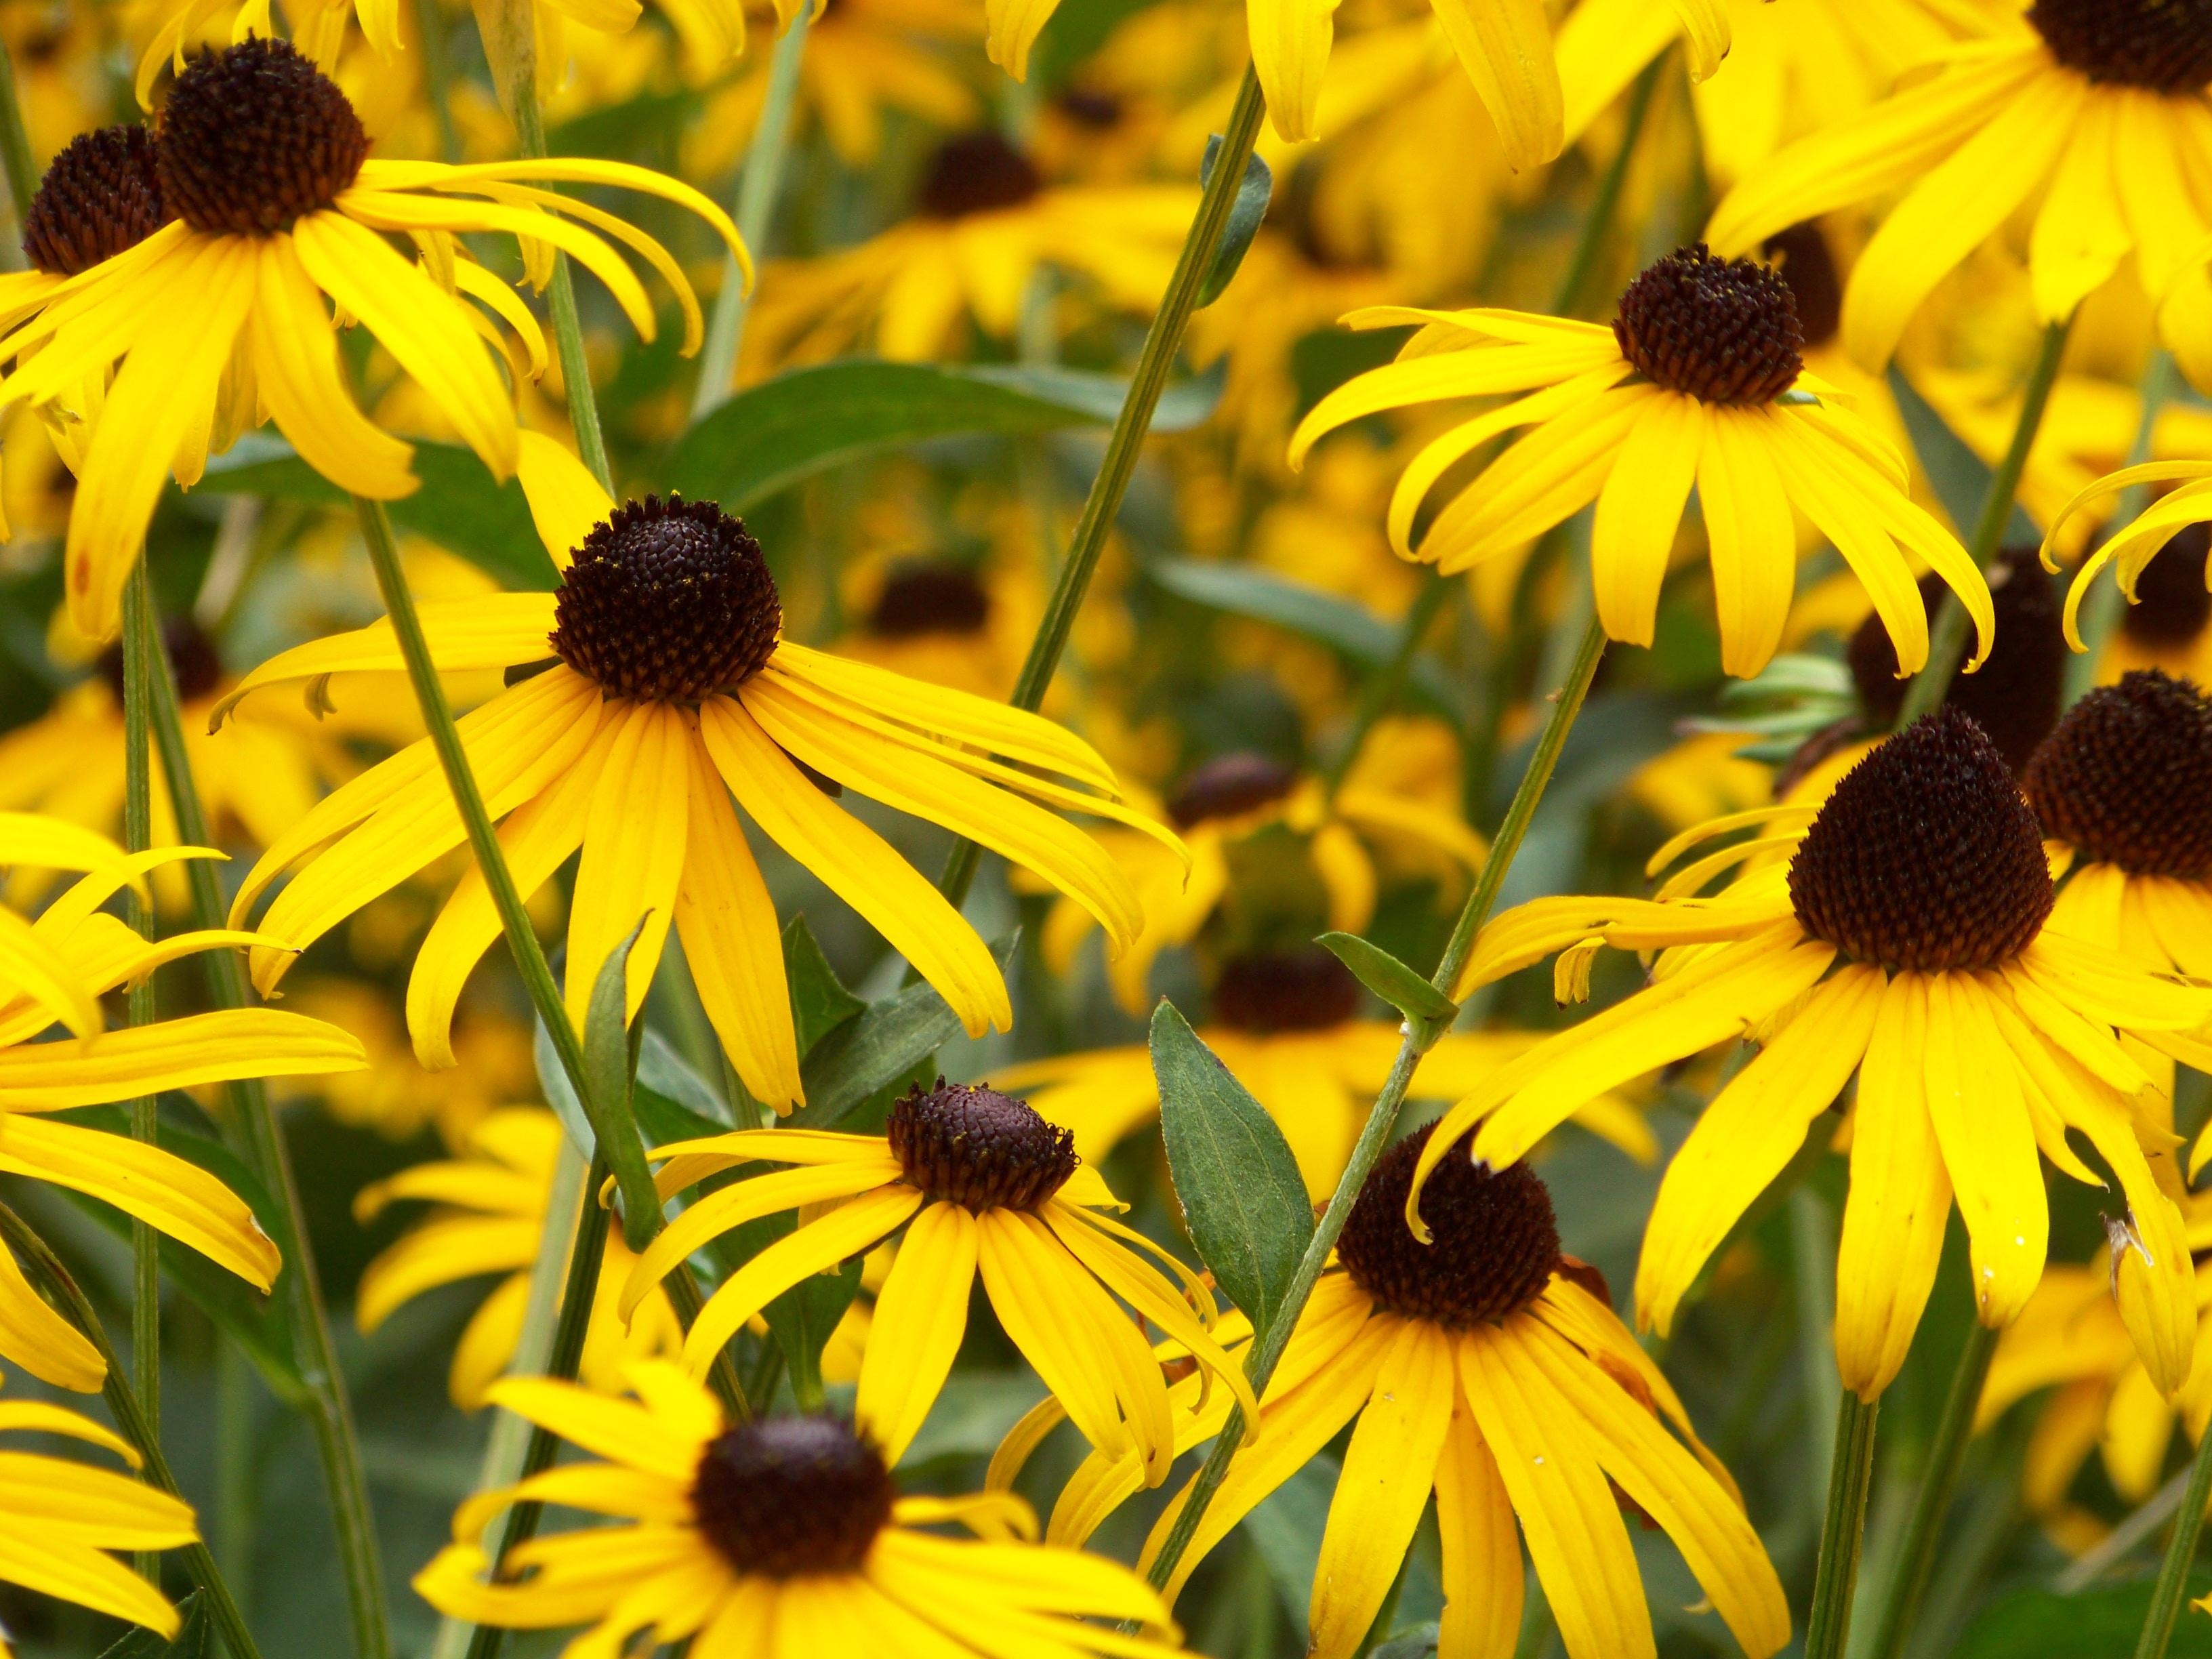 Yellow black-eyed Susan flowers in full bloom